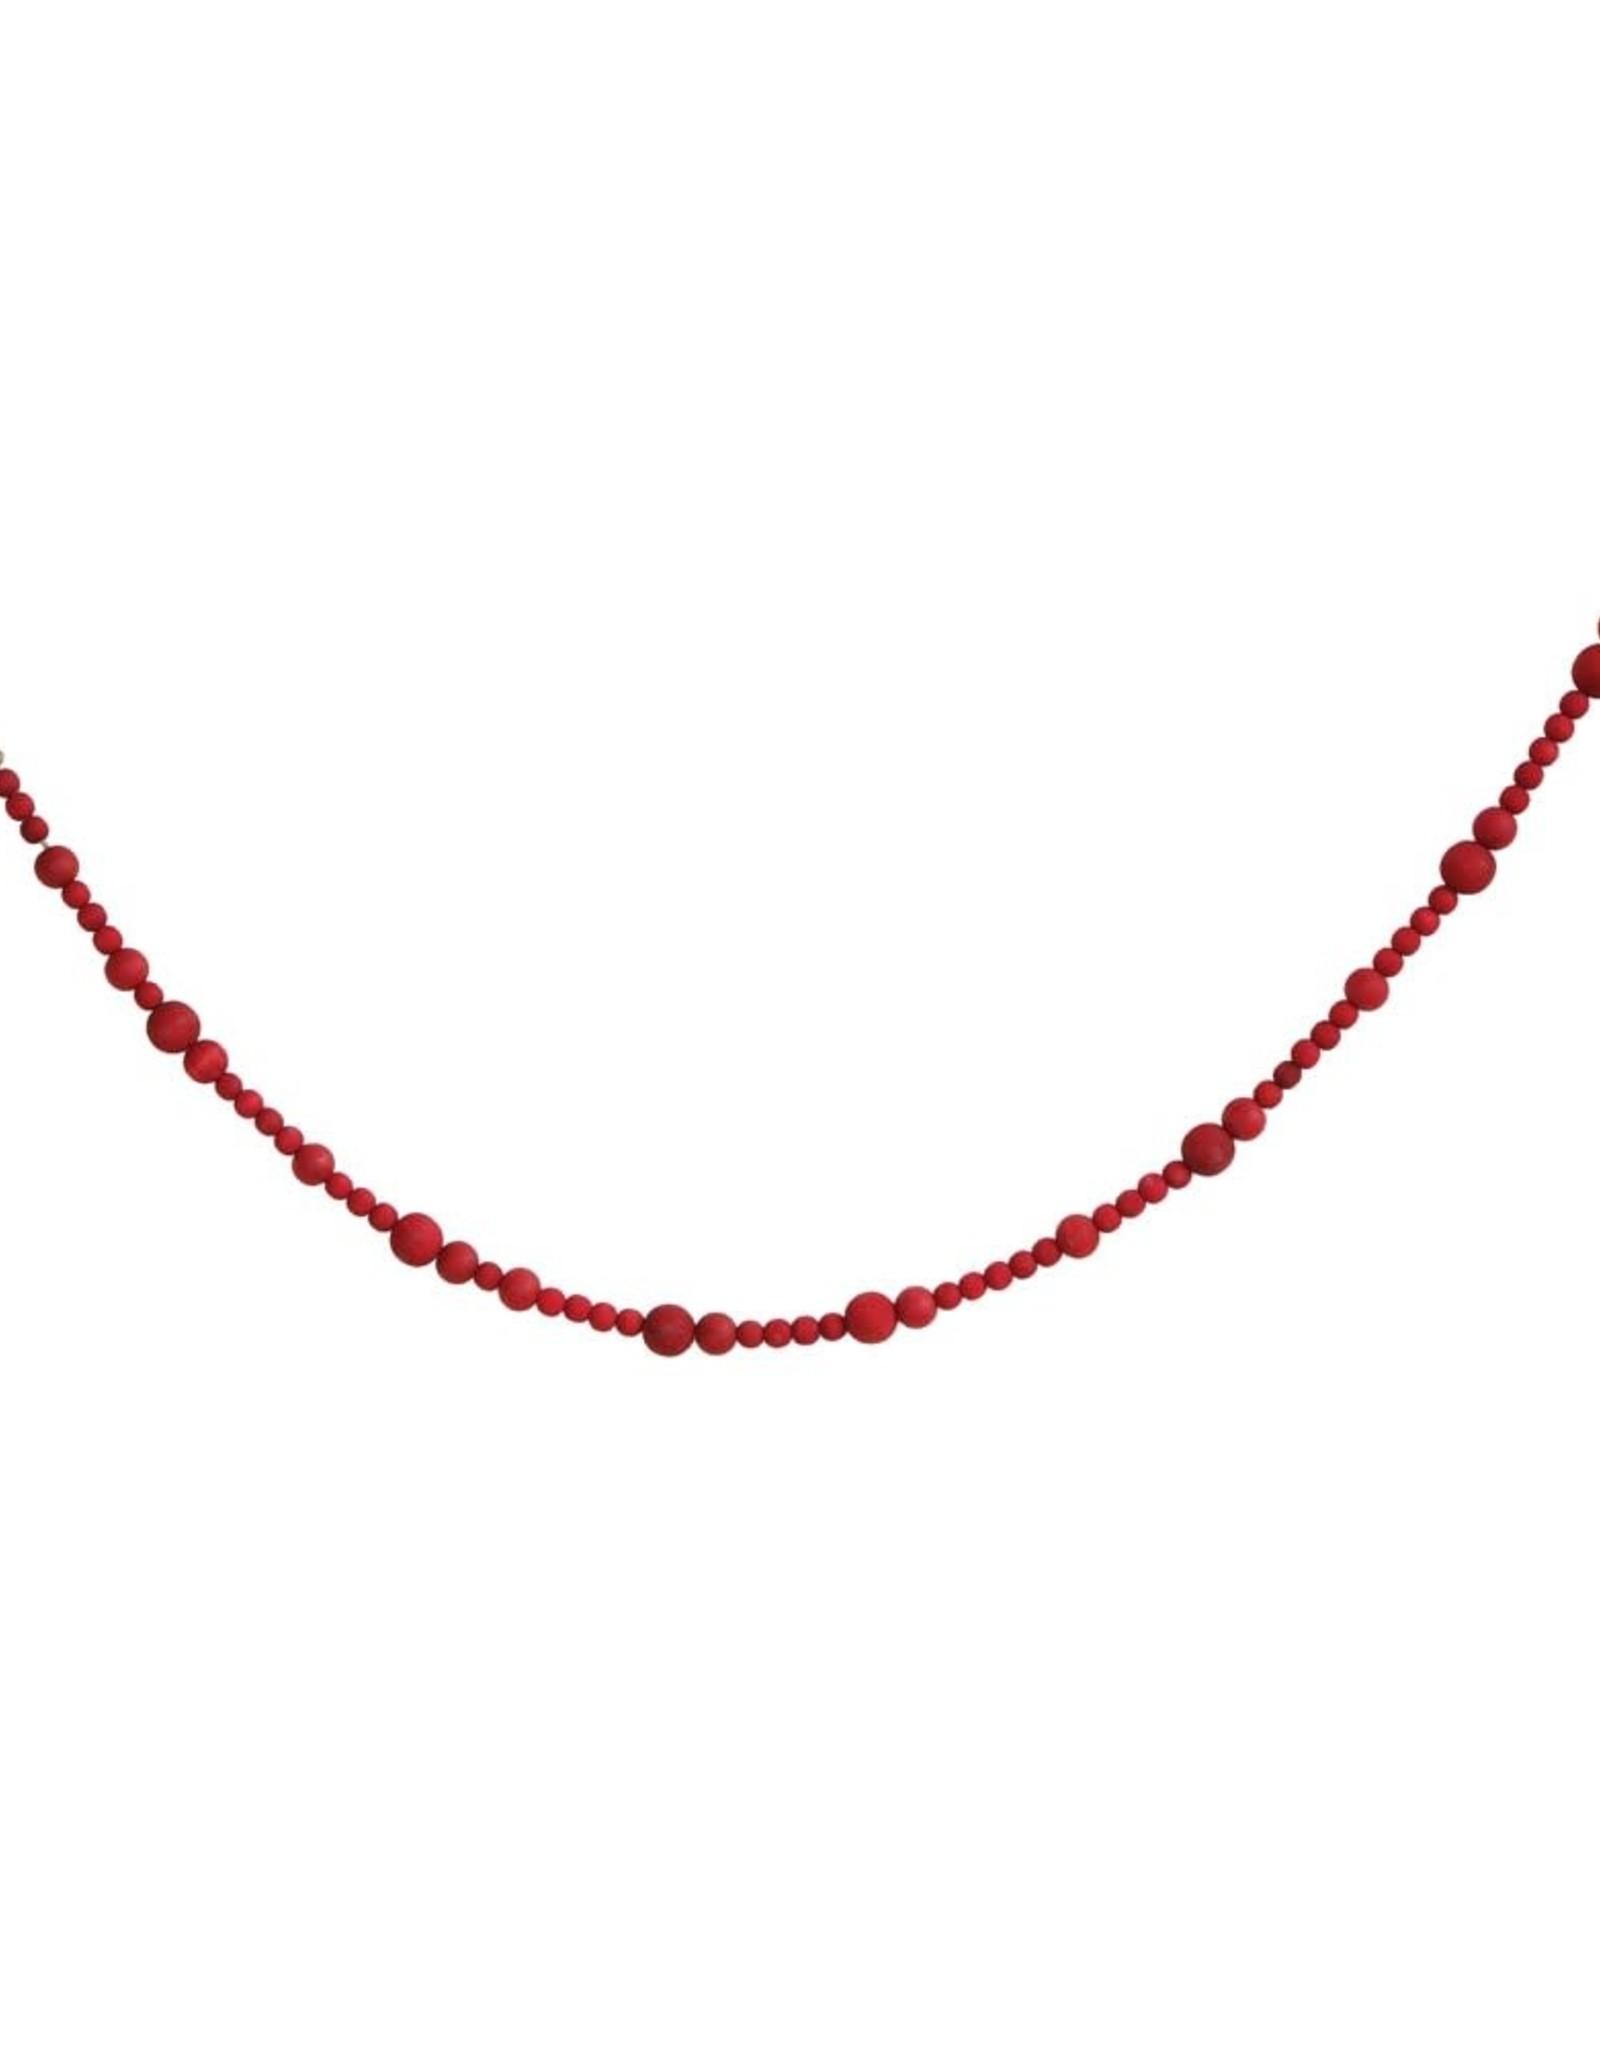 GARLAND PAULOWNIA WOOD BEAD 72 INCHES RED